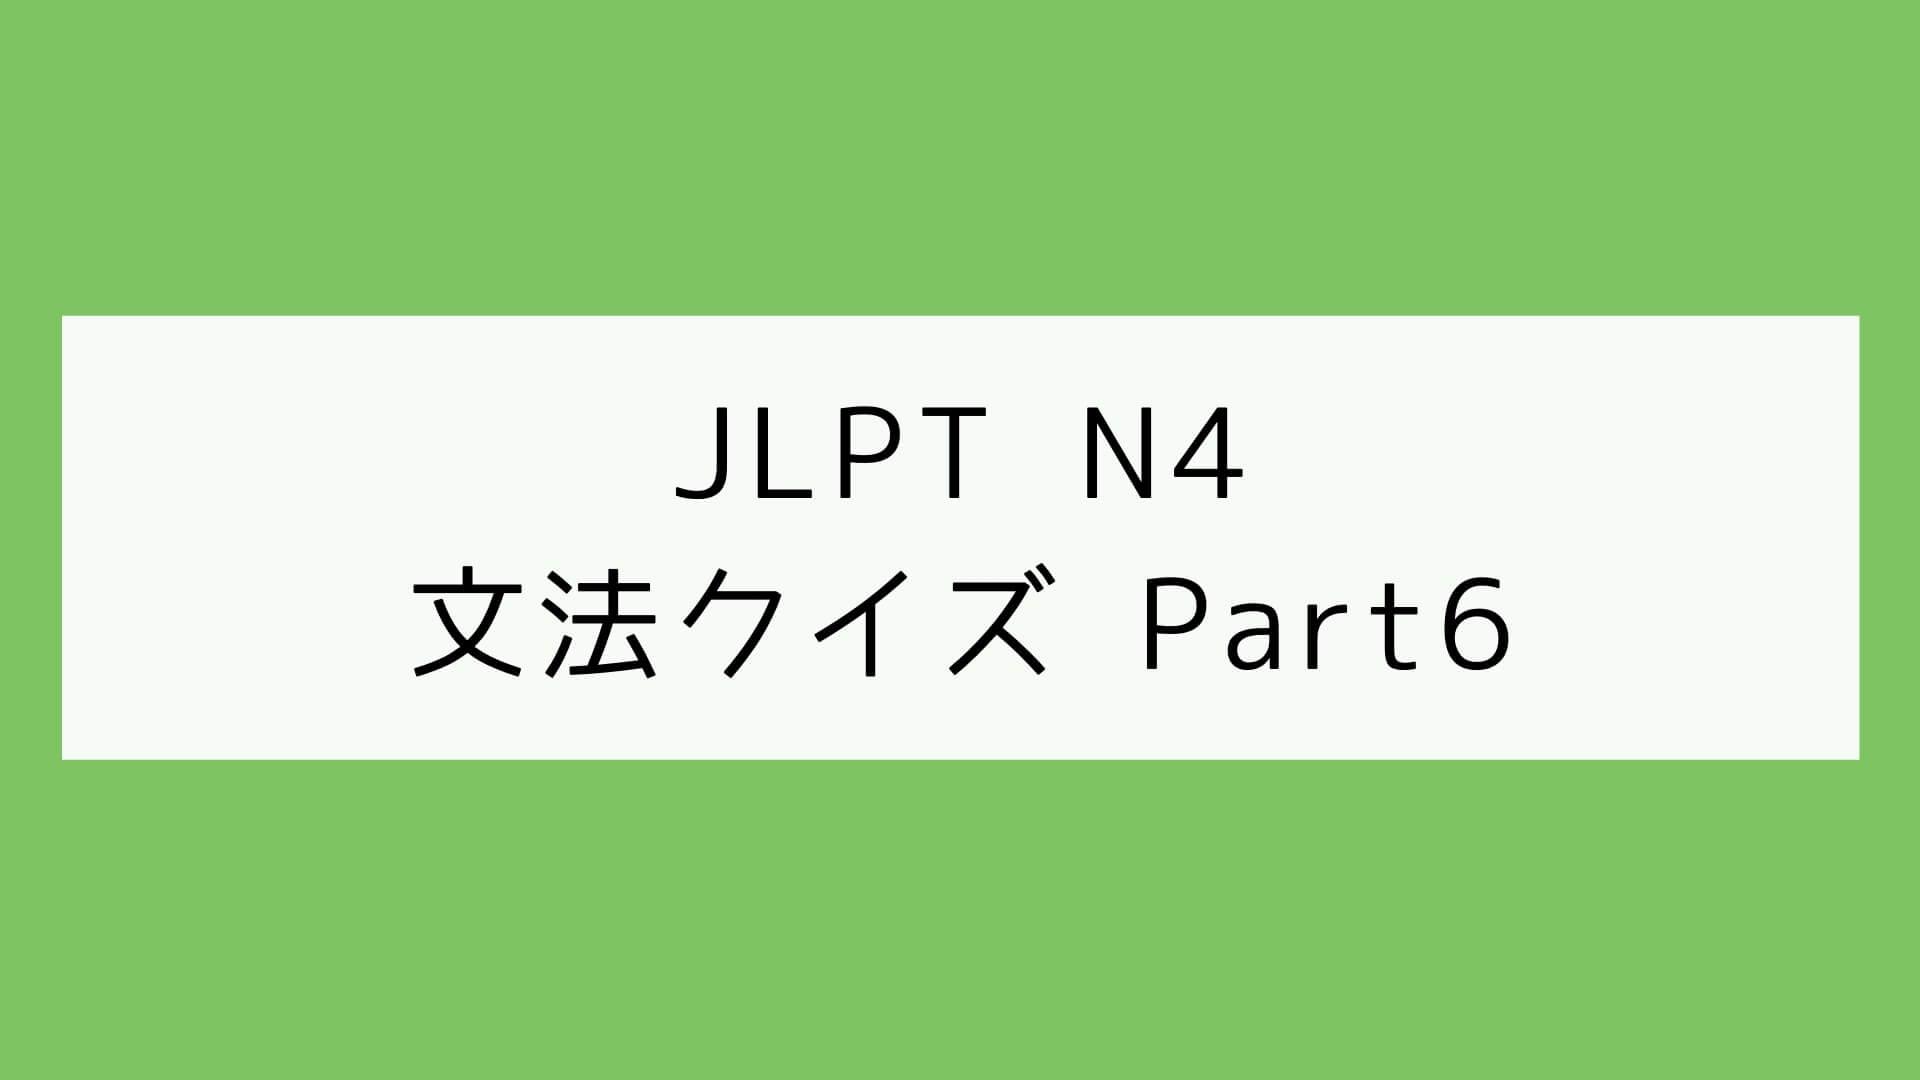 【JLPT N4】文法クイズ Part6